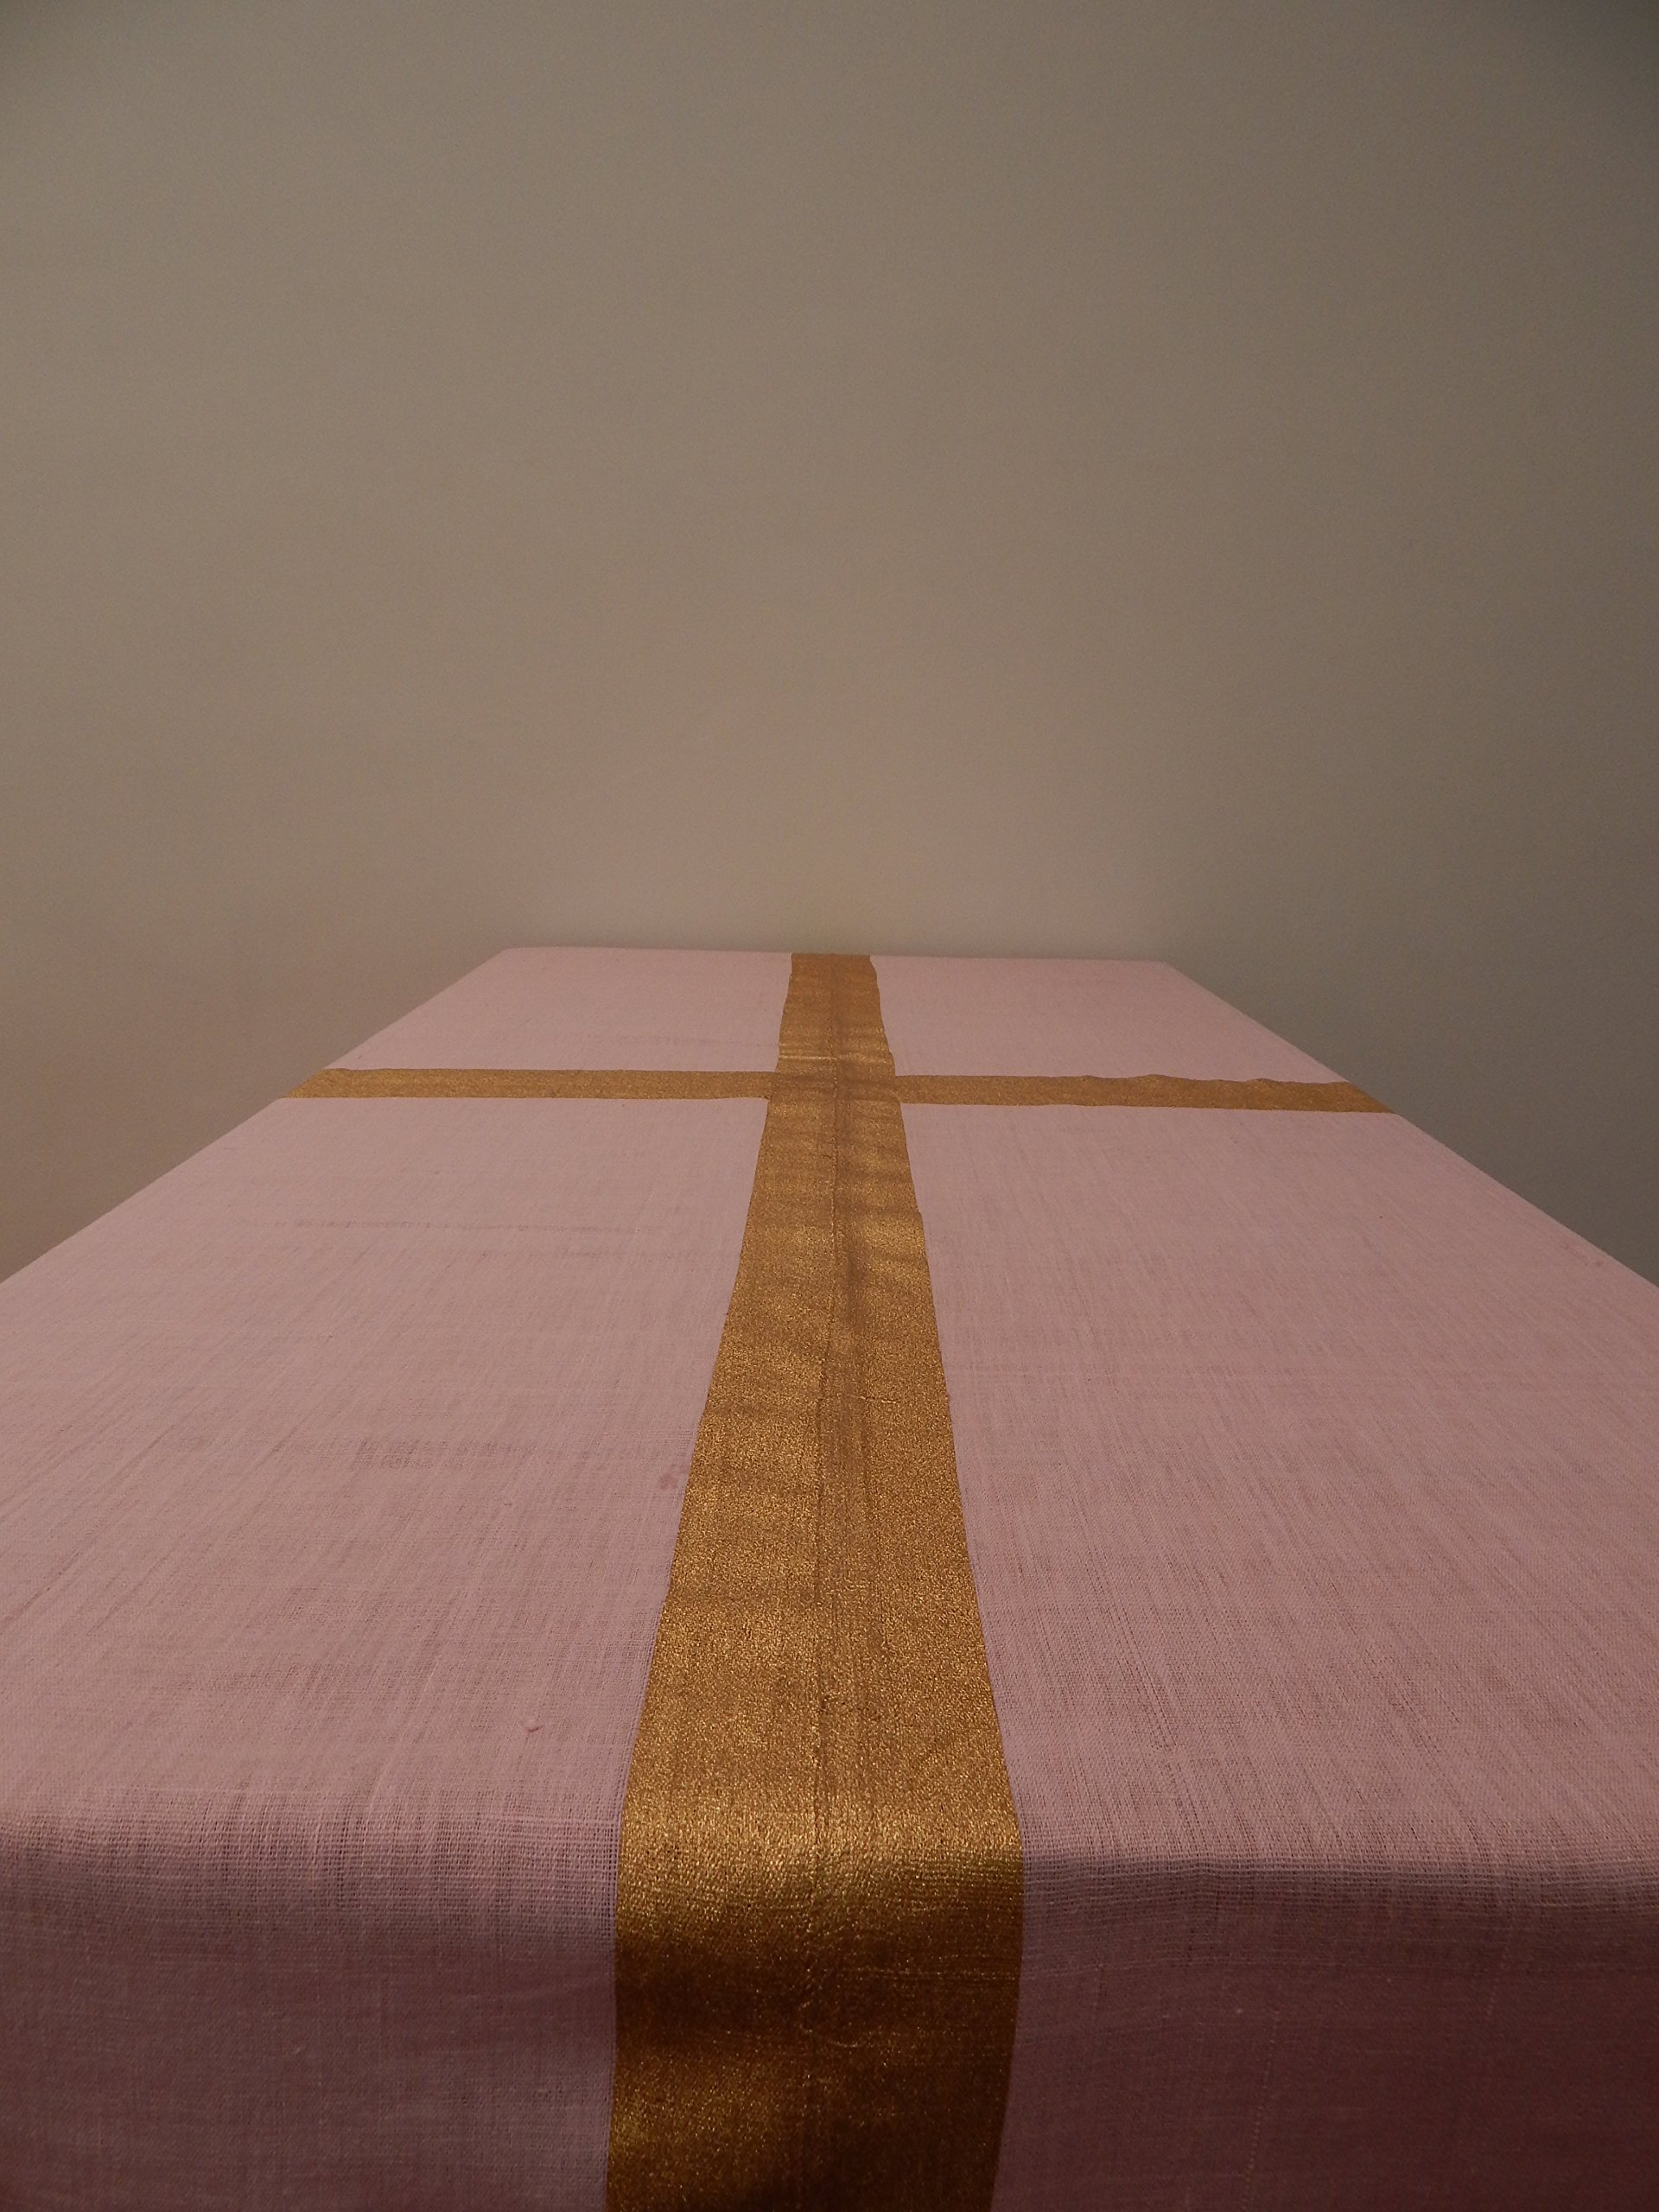 Gitika Goyal Home Cotton Khadi Gold Screen Printed Tablecloth with Border Design, Pink, 72'' x 72''